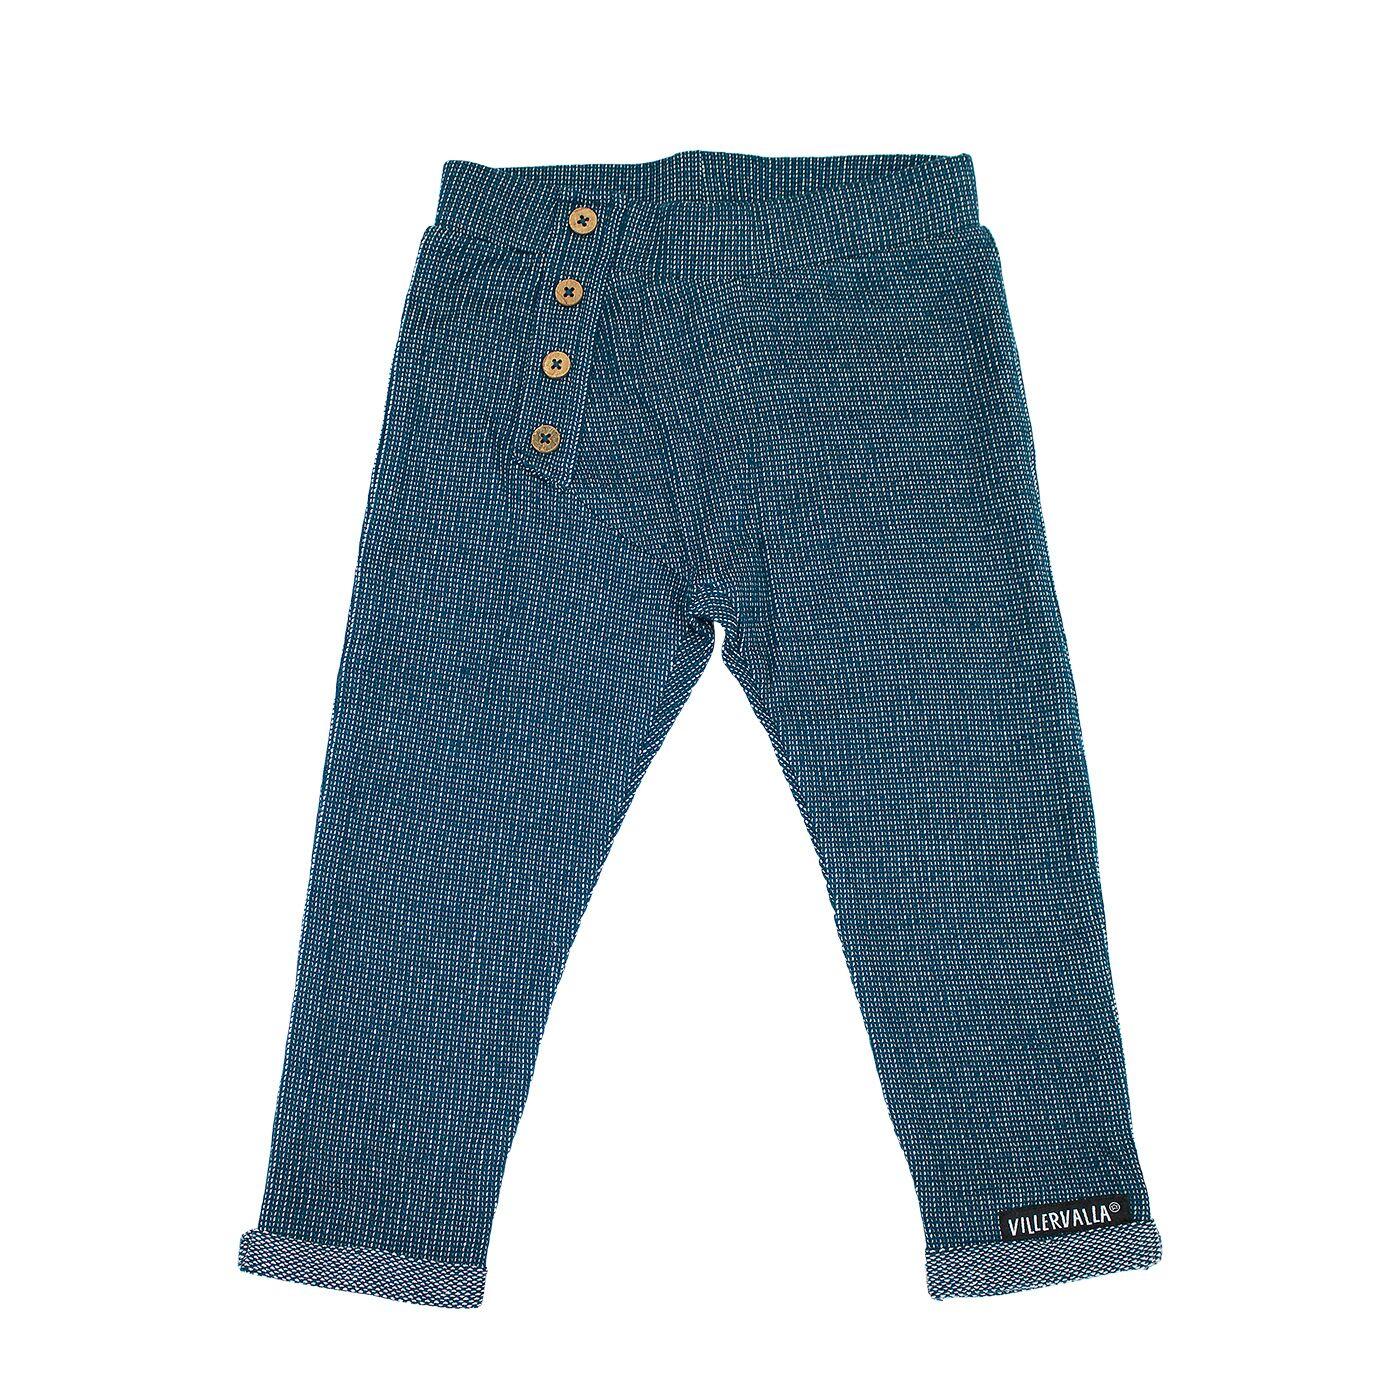 Villervalla Nordic Knit broekje Marineblauw